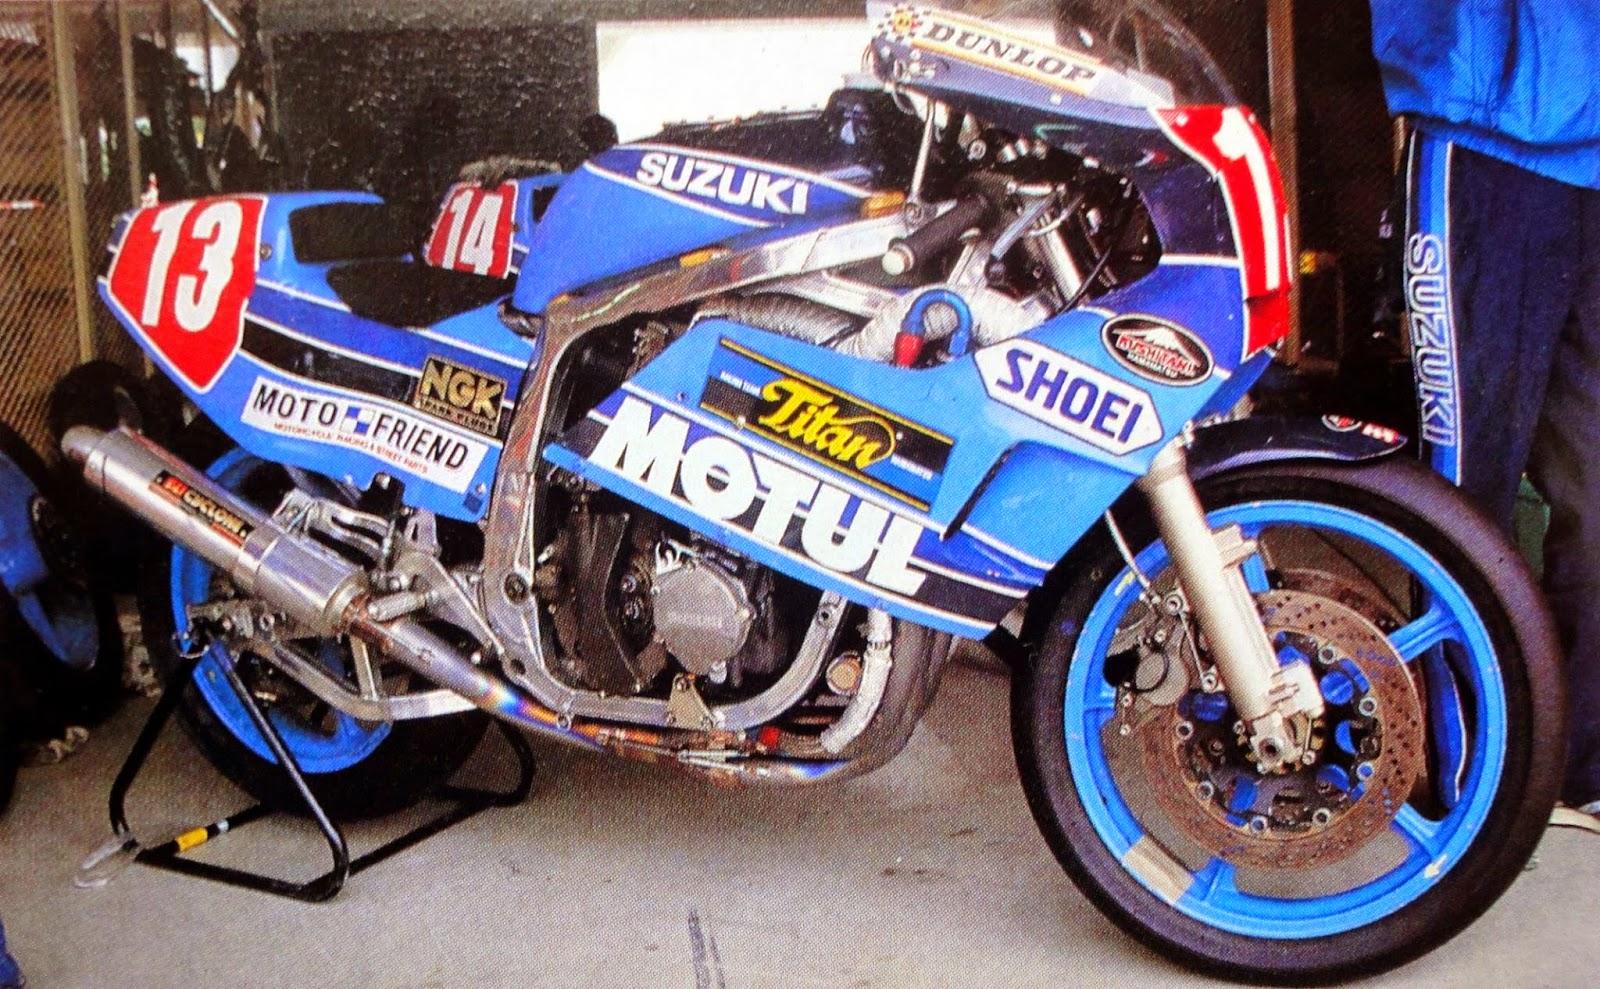 Suzuki GSX-R 750 limited early superbike racer Japanese